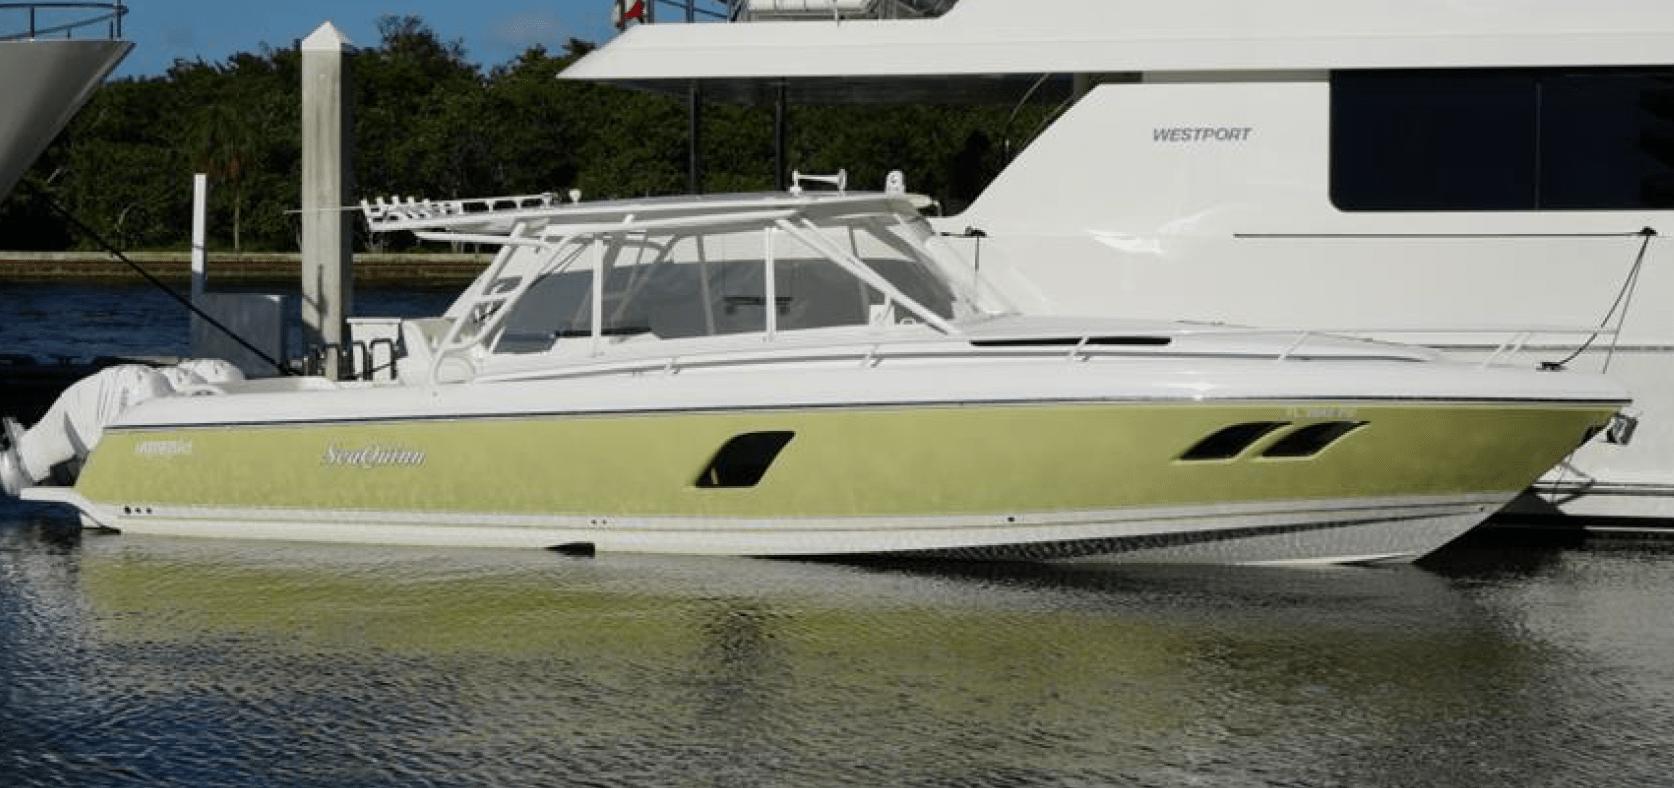 A Sea Quinn near other yachts